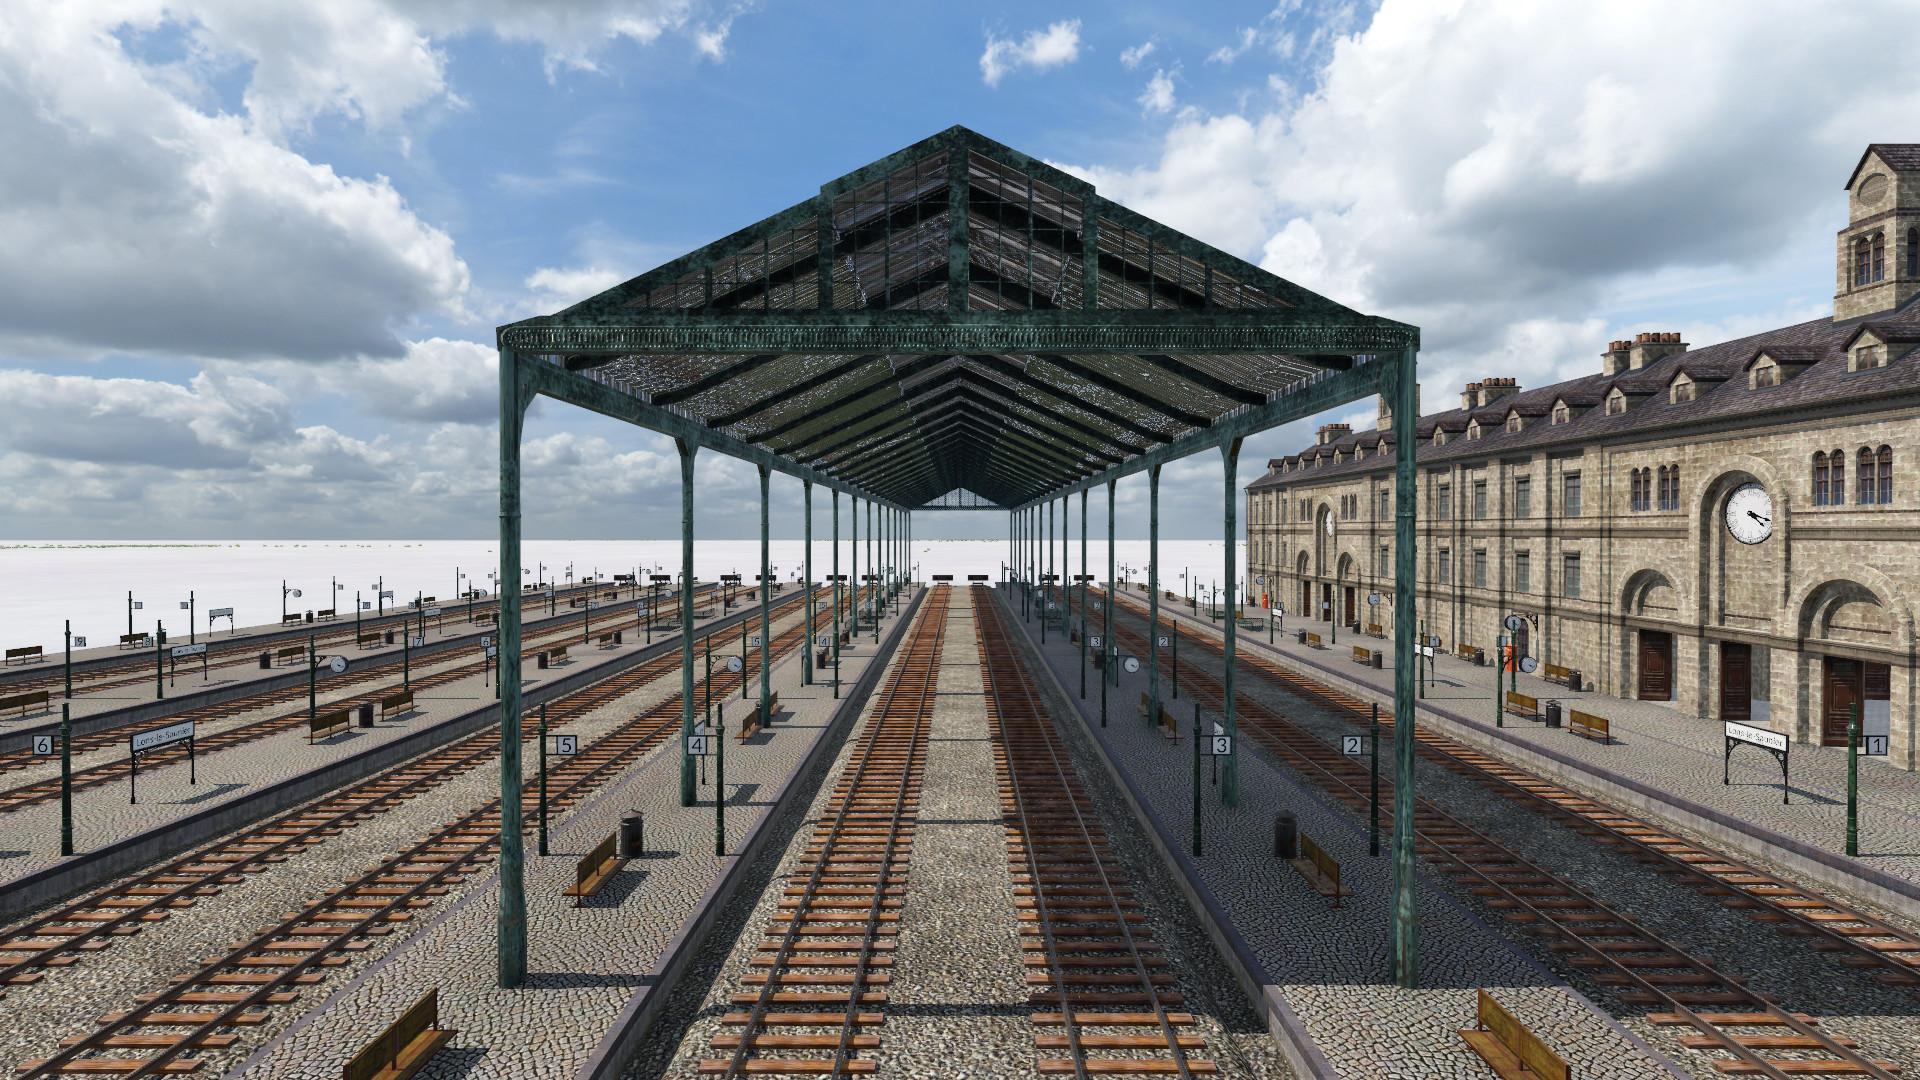 Transport Fever 2 - Perrache Modular Station Roof